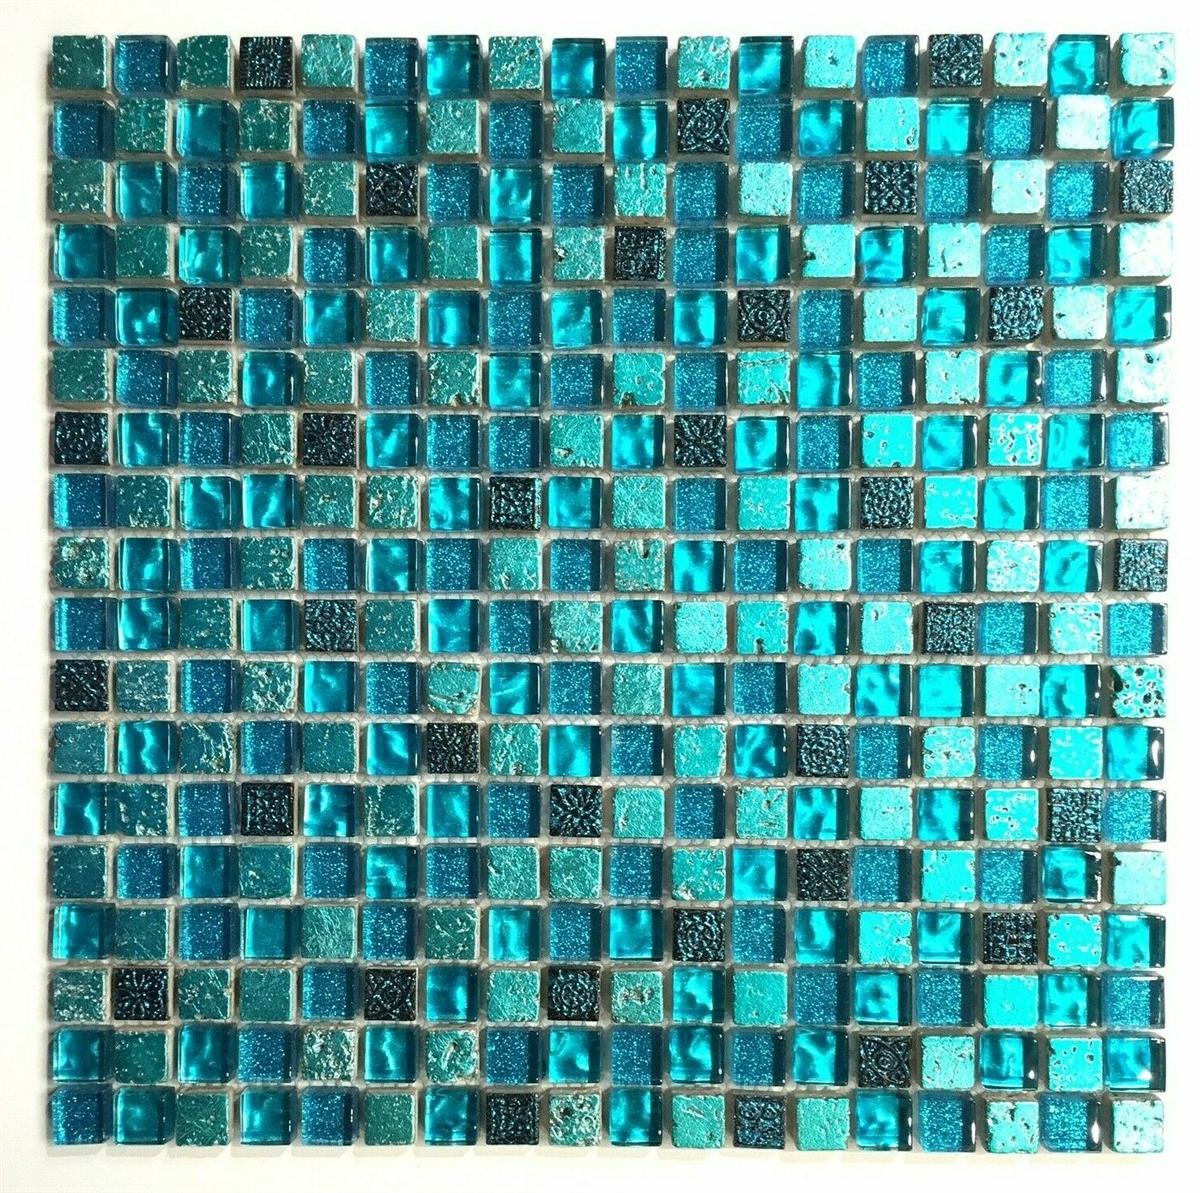 5 8 x 5 8 cadiz collection turquoise blue glass mix mosaic on mesh mount